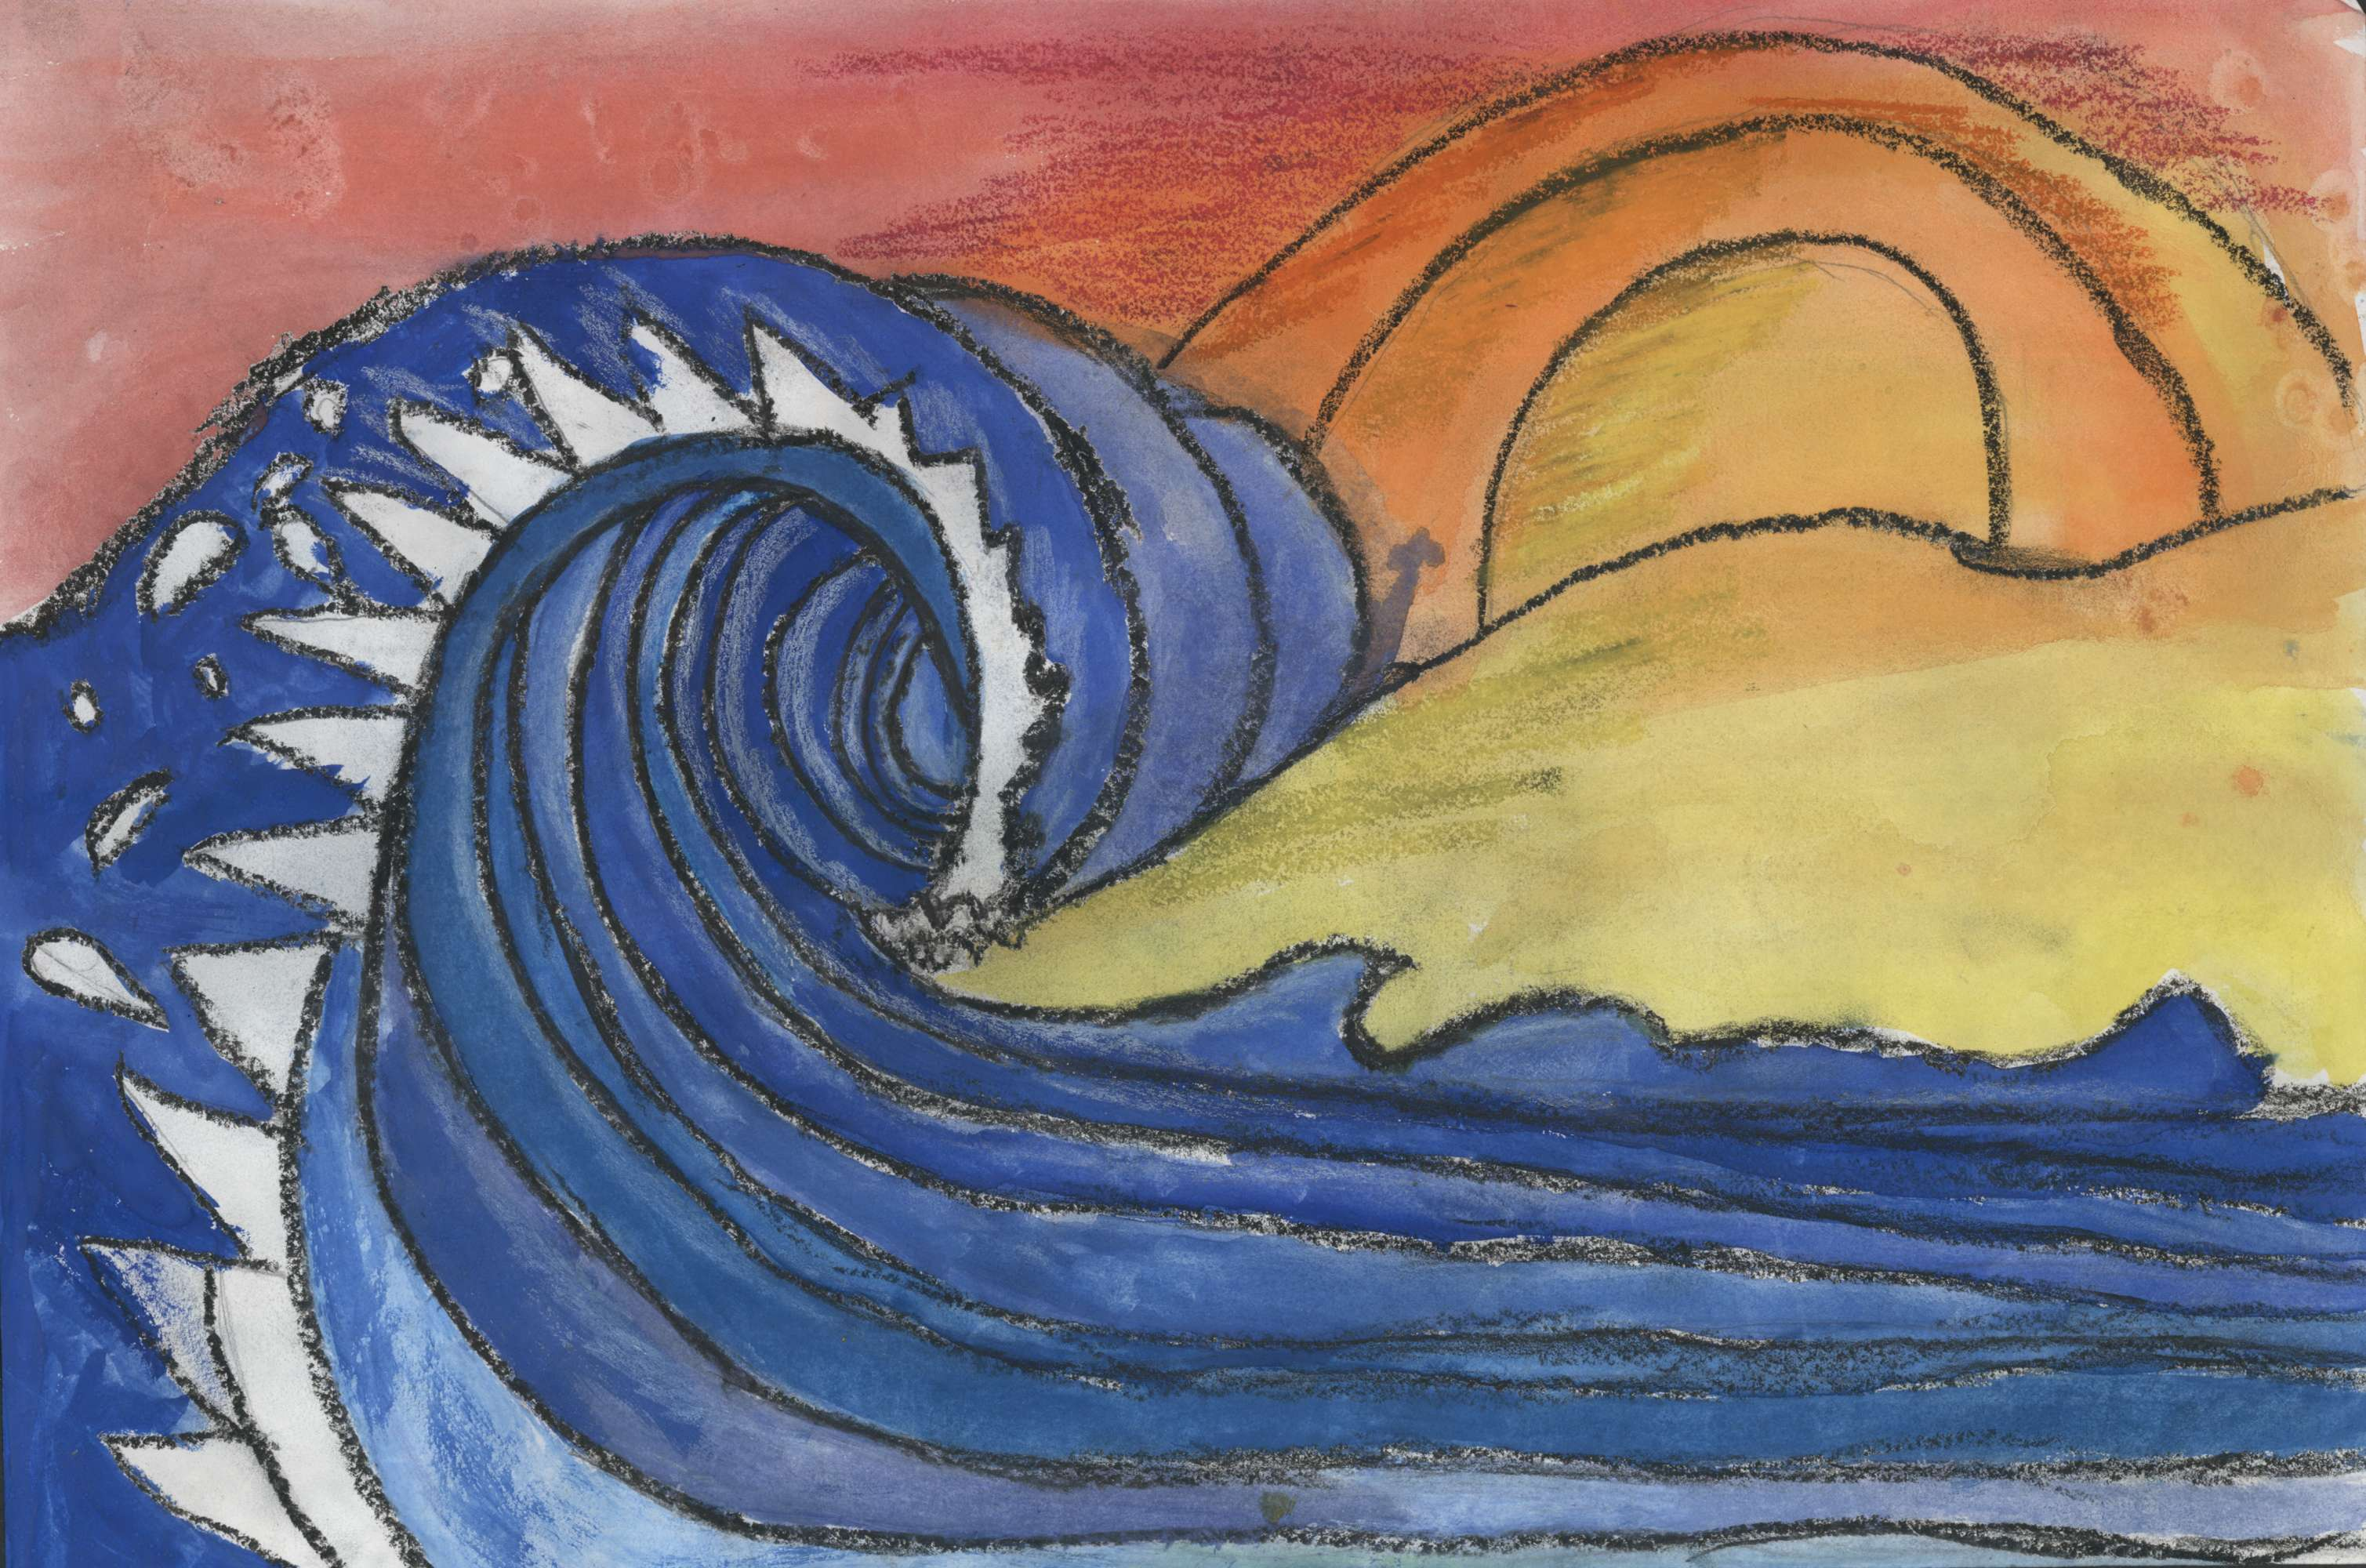 Swell Art 4